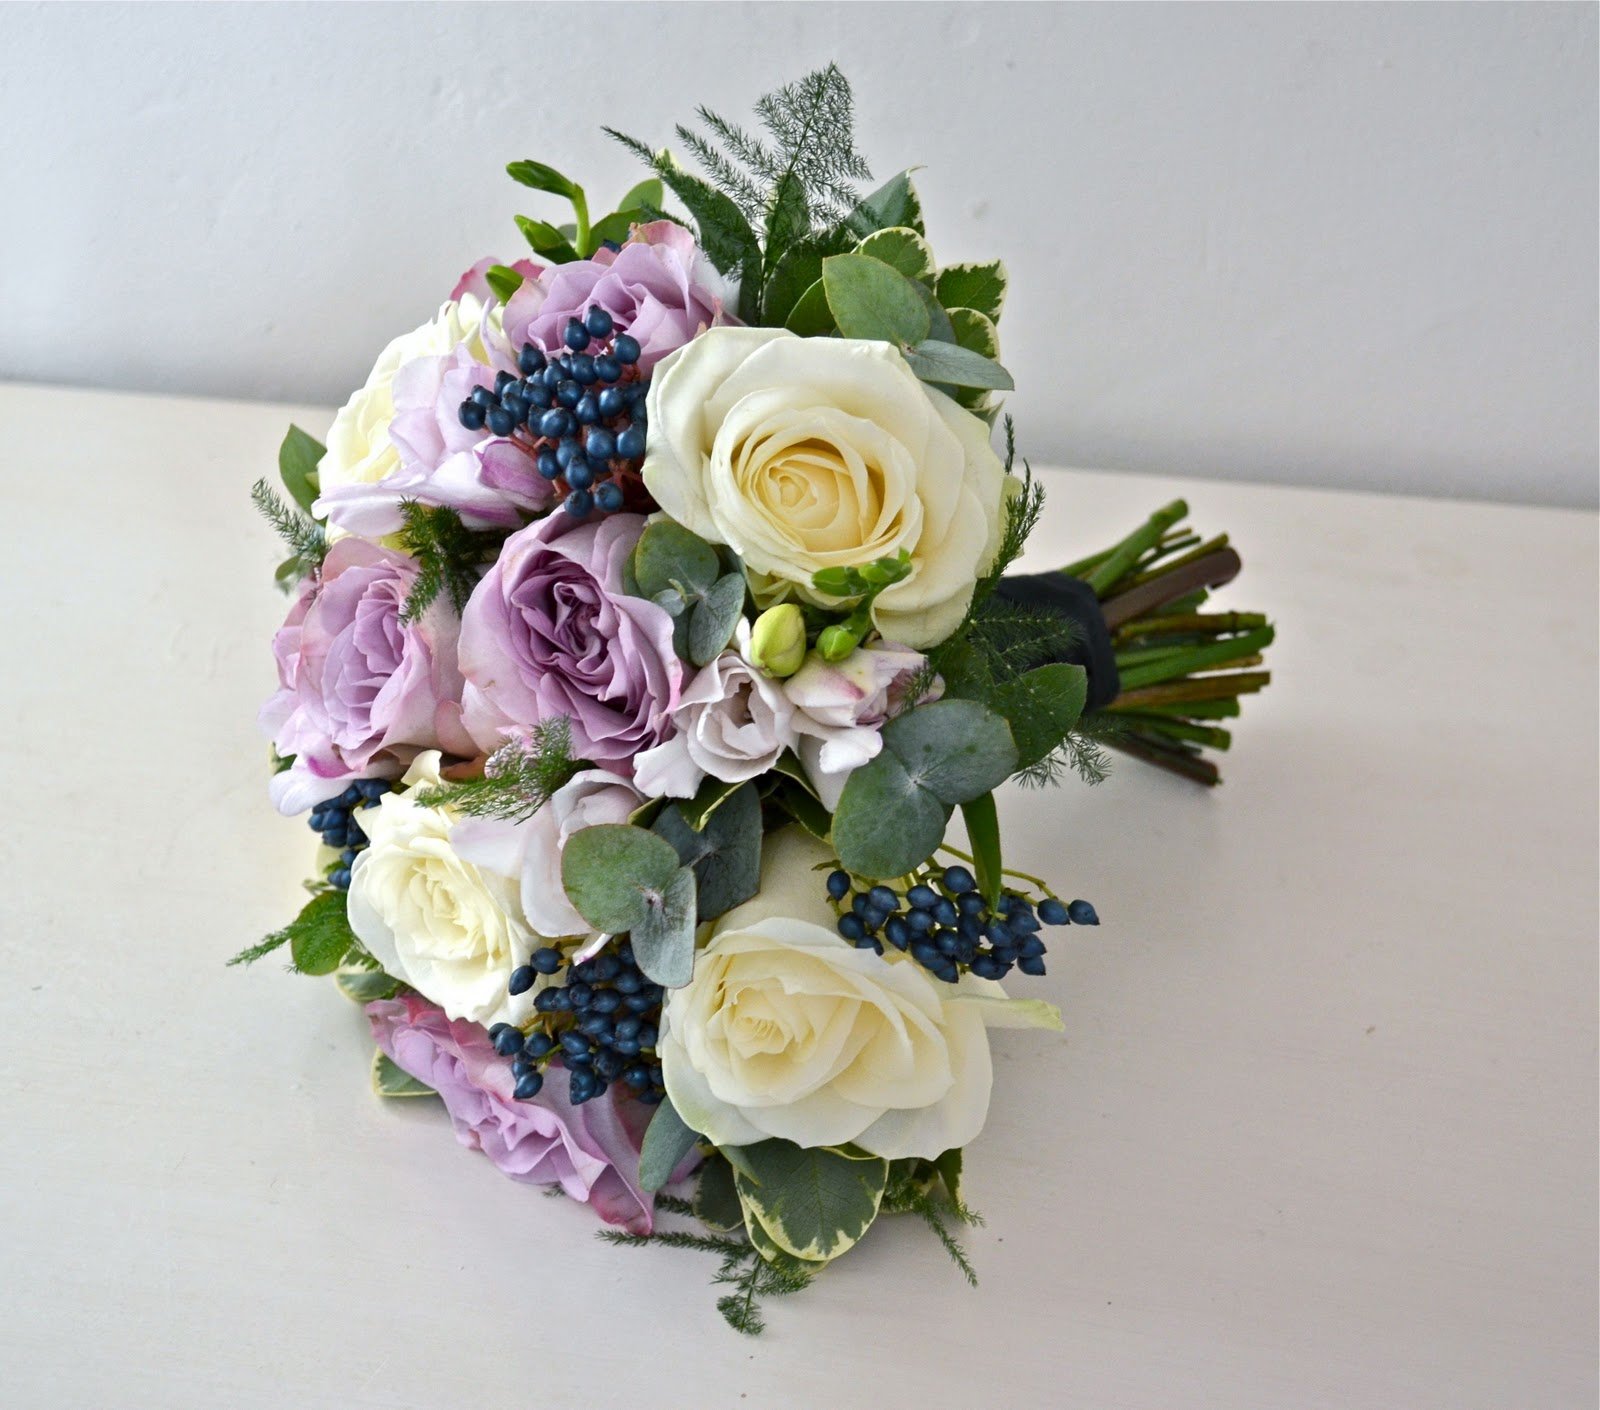 Wedding Flowers December: Wedding Flowers Blog: December 2011